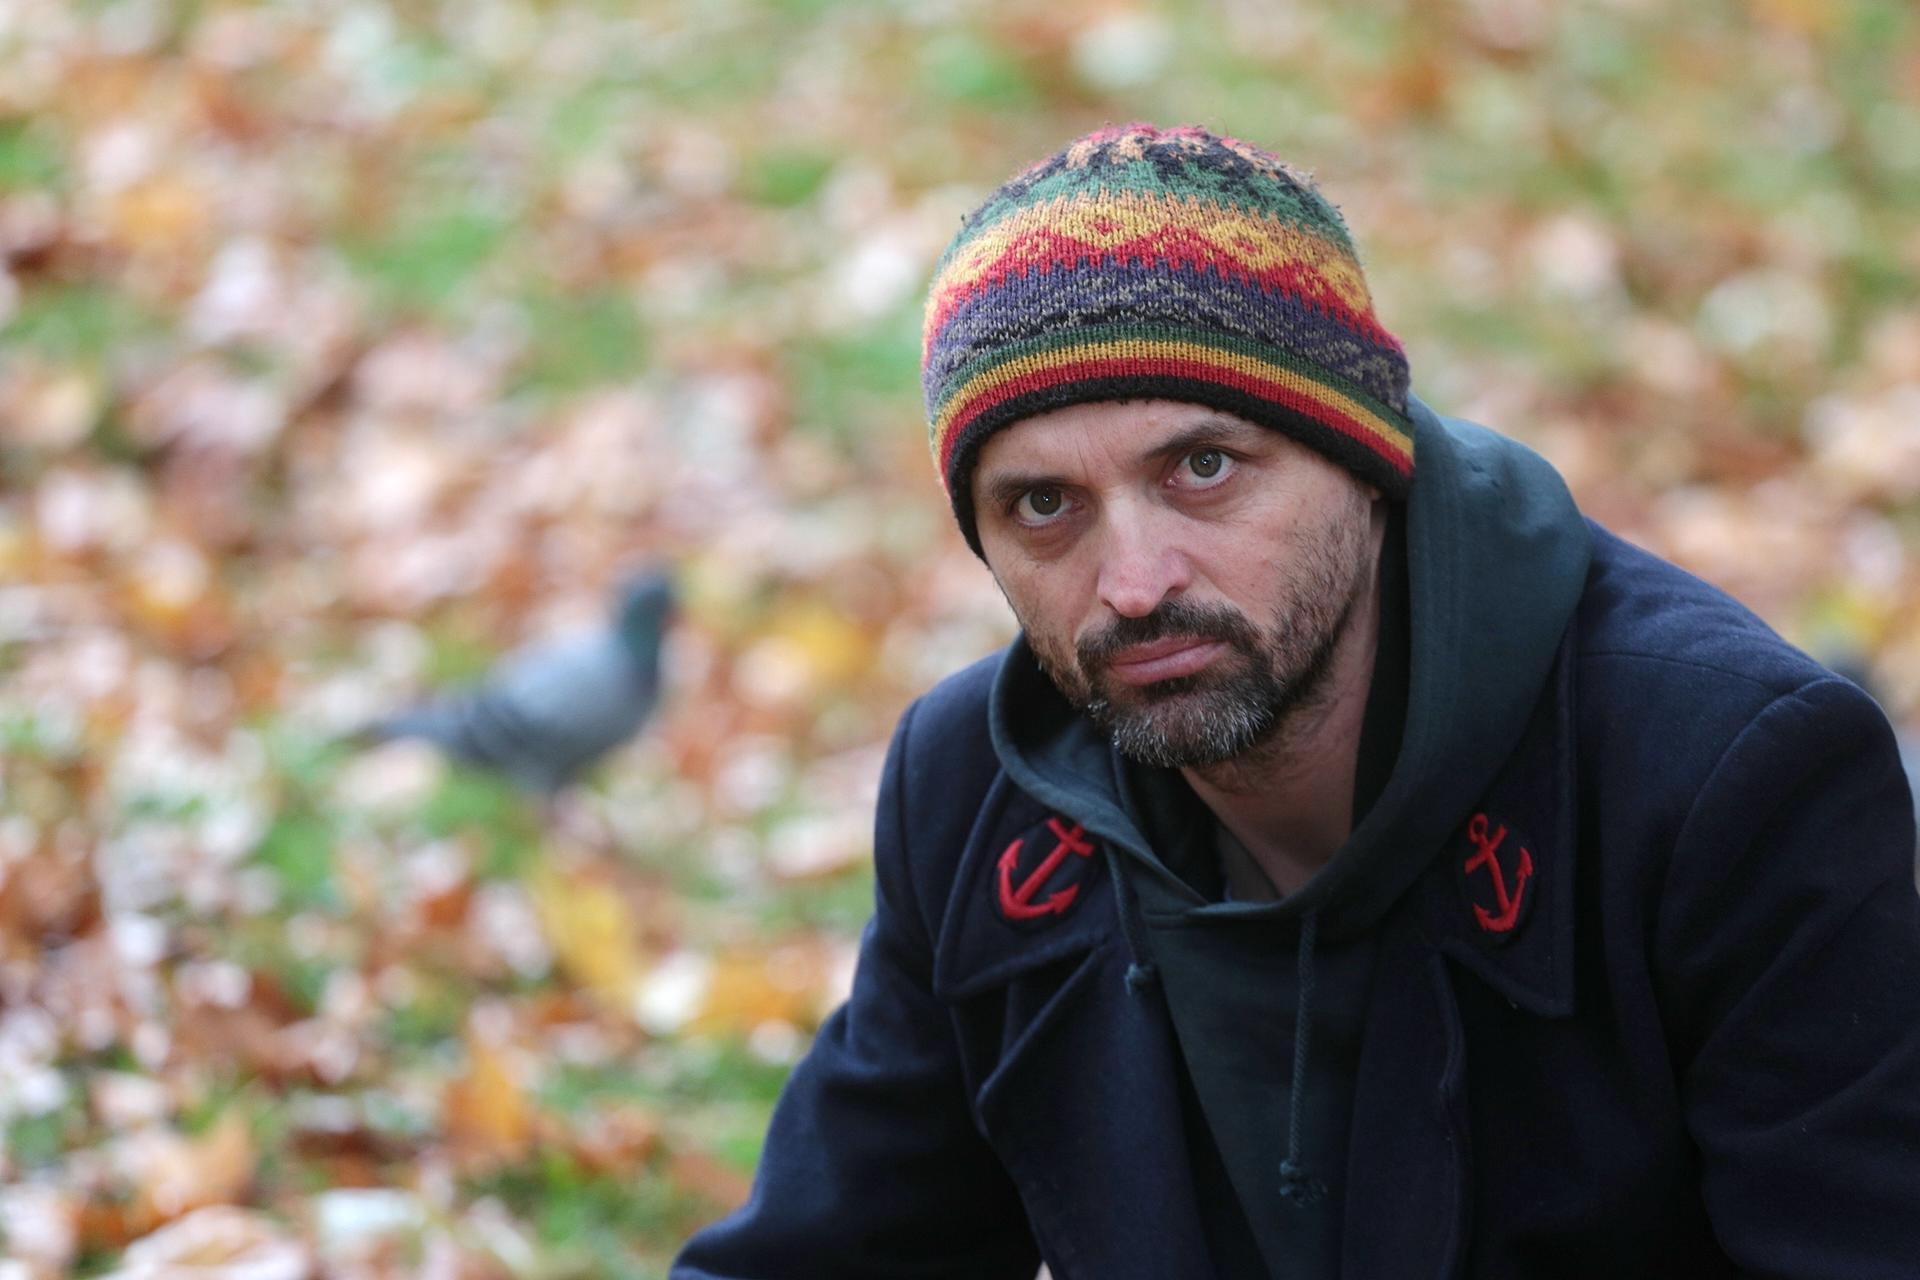 Damir Karakaš